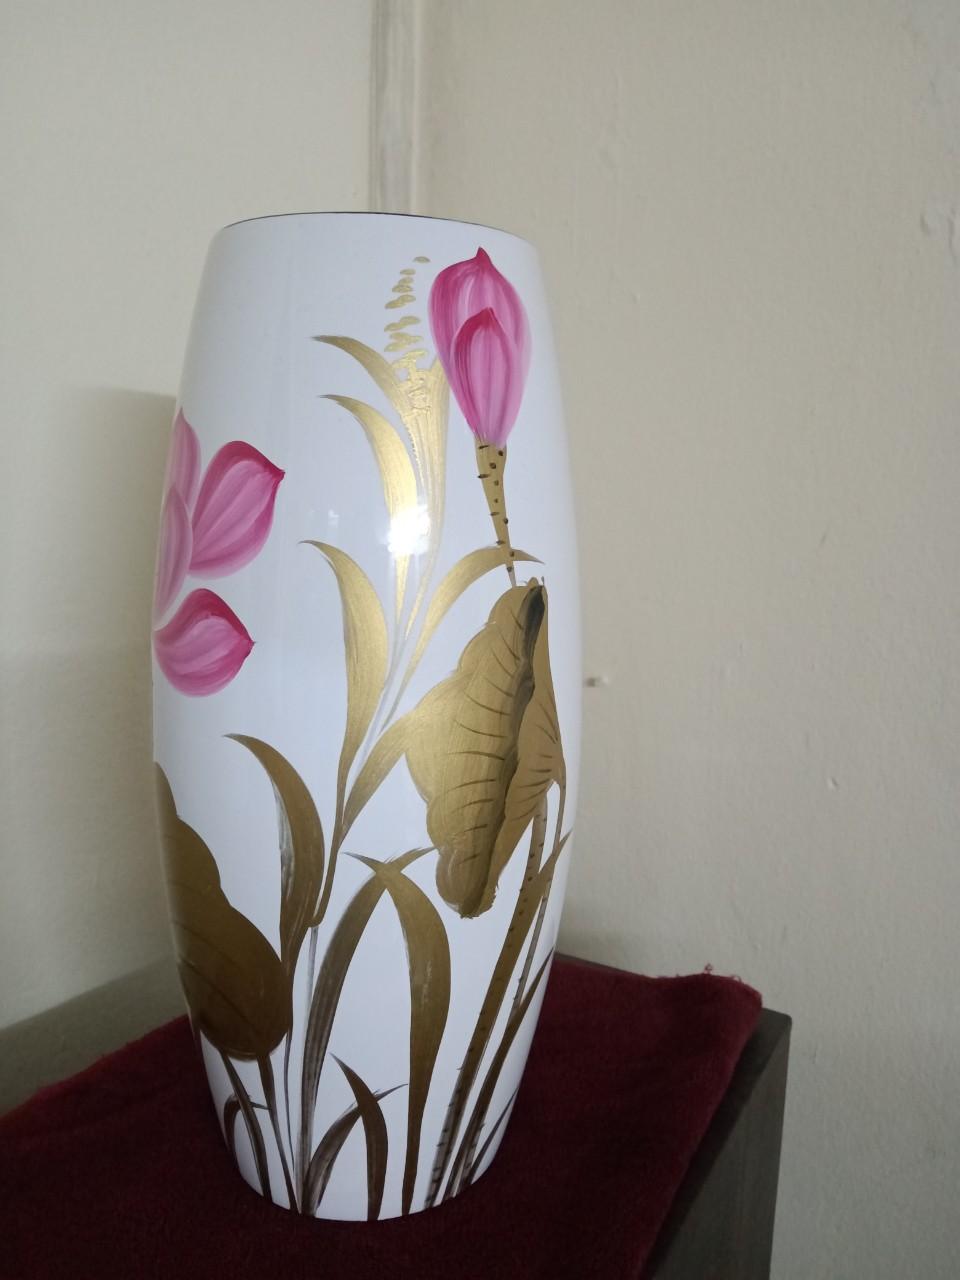 Lọ hoa vẽ sen gốm sứ Bát Tràng